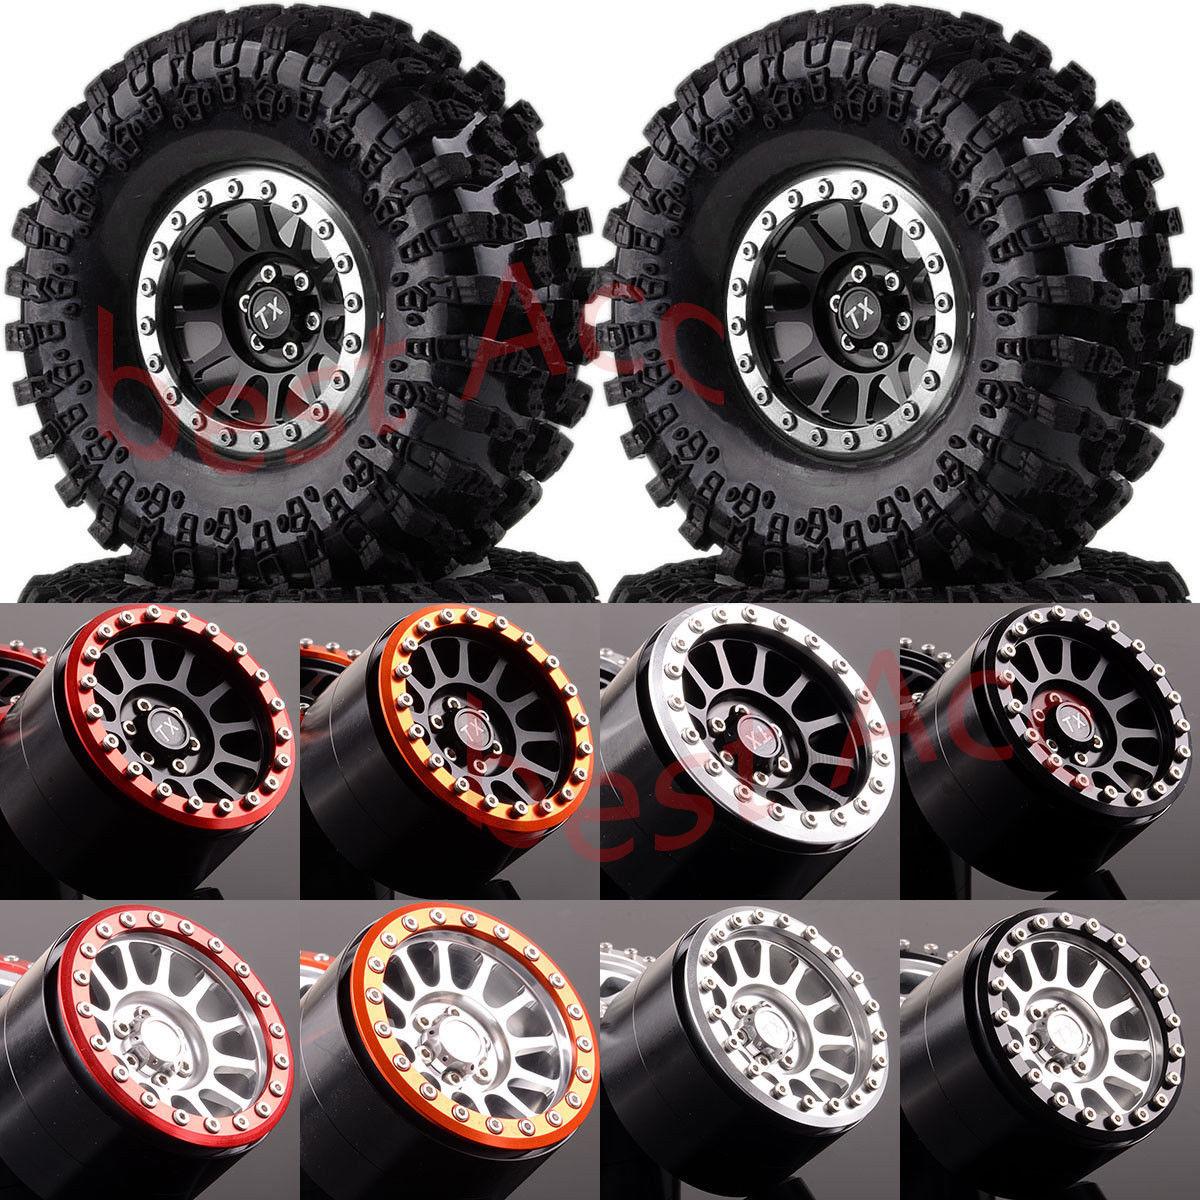 2022-3021 1/10 4 P aluminium 2.2 Beadlock roues jante et pneus pour RC Rock chenille2022-3021 1/10 4 P aluminium 2.2 Beadlock roues jante et pneus pour RC Rock chenille